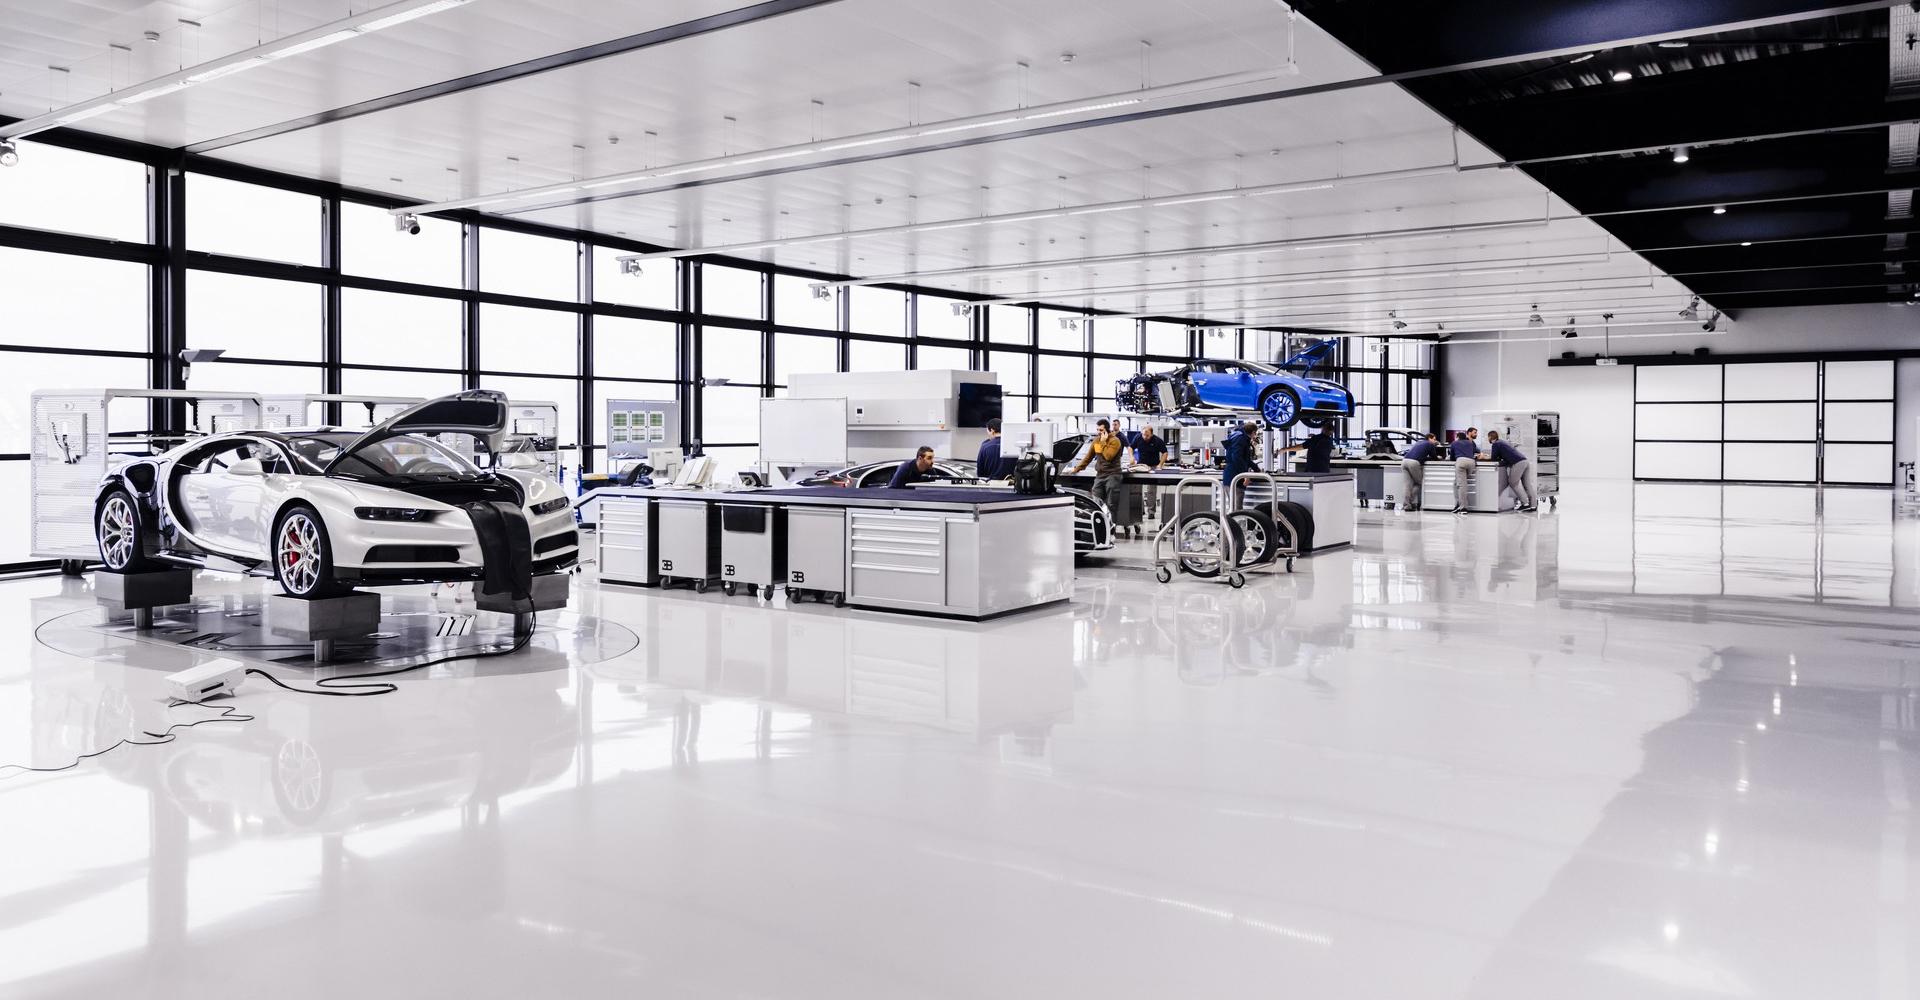 Vloeistofdichte vloer fabriek